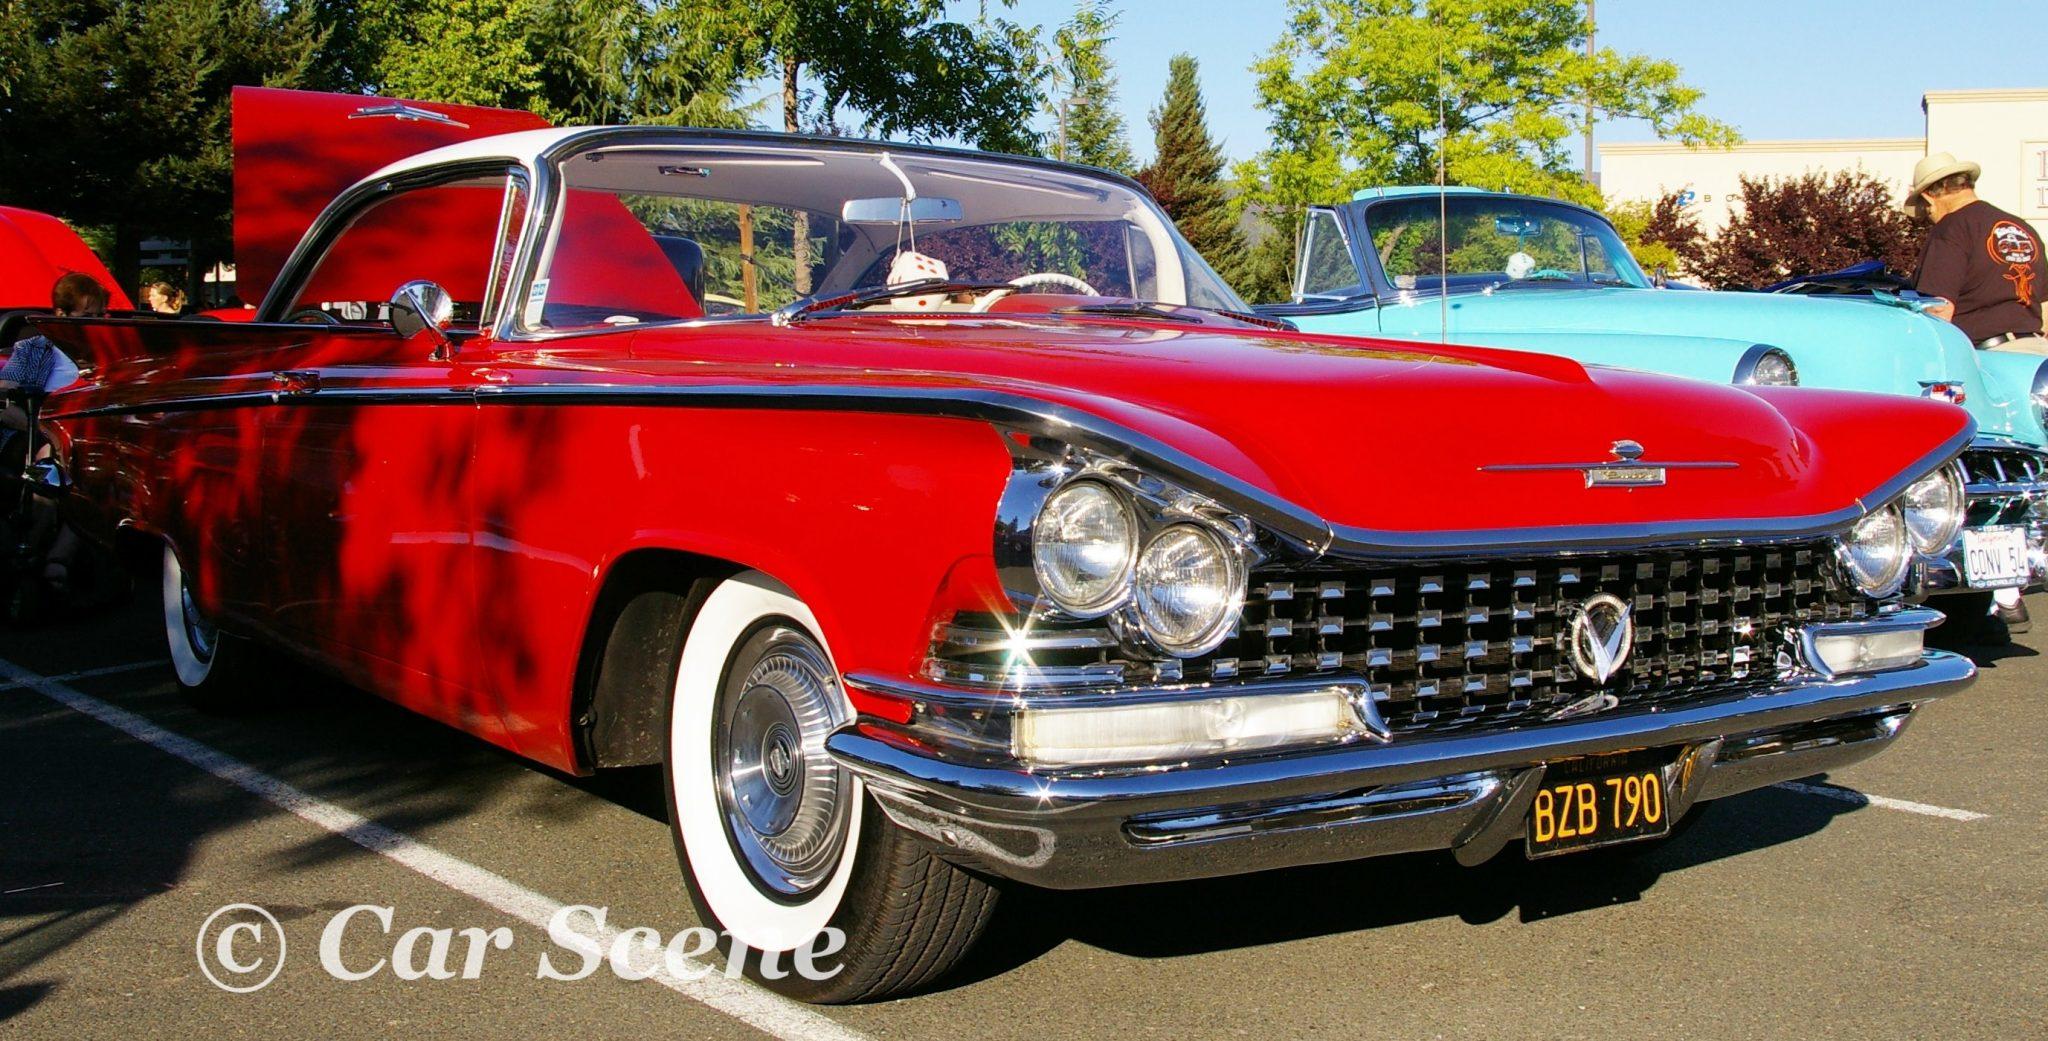 1959 Buick Invicta Hardtop front three quarters view